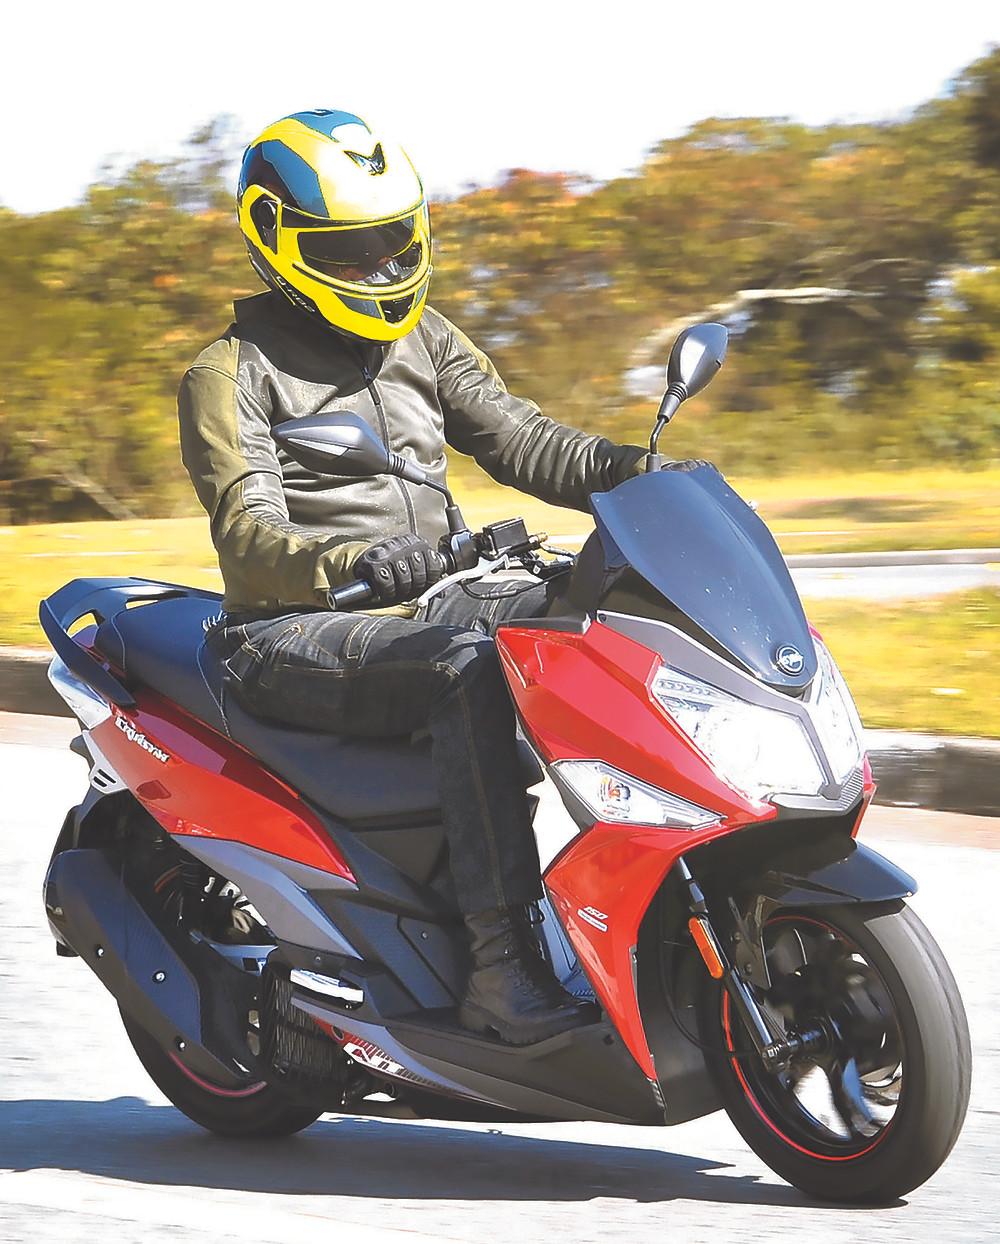 Scooter Dafra Cruisym 150 no Brasil